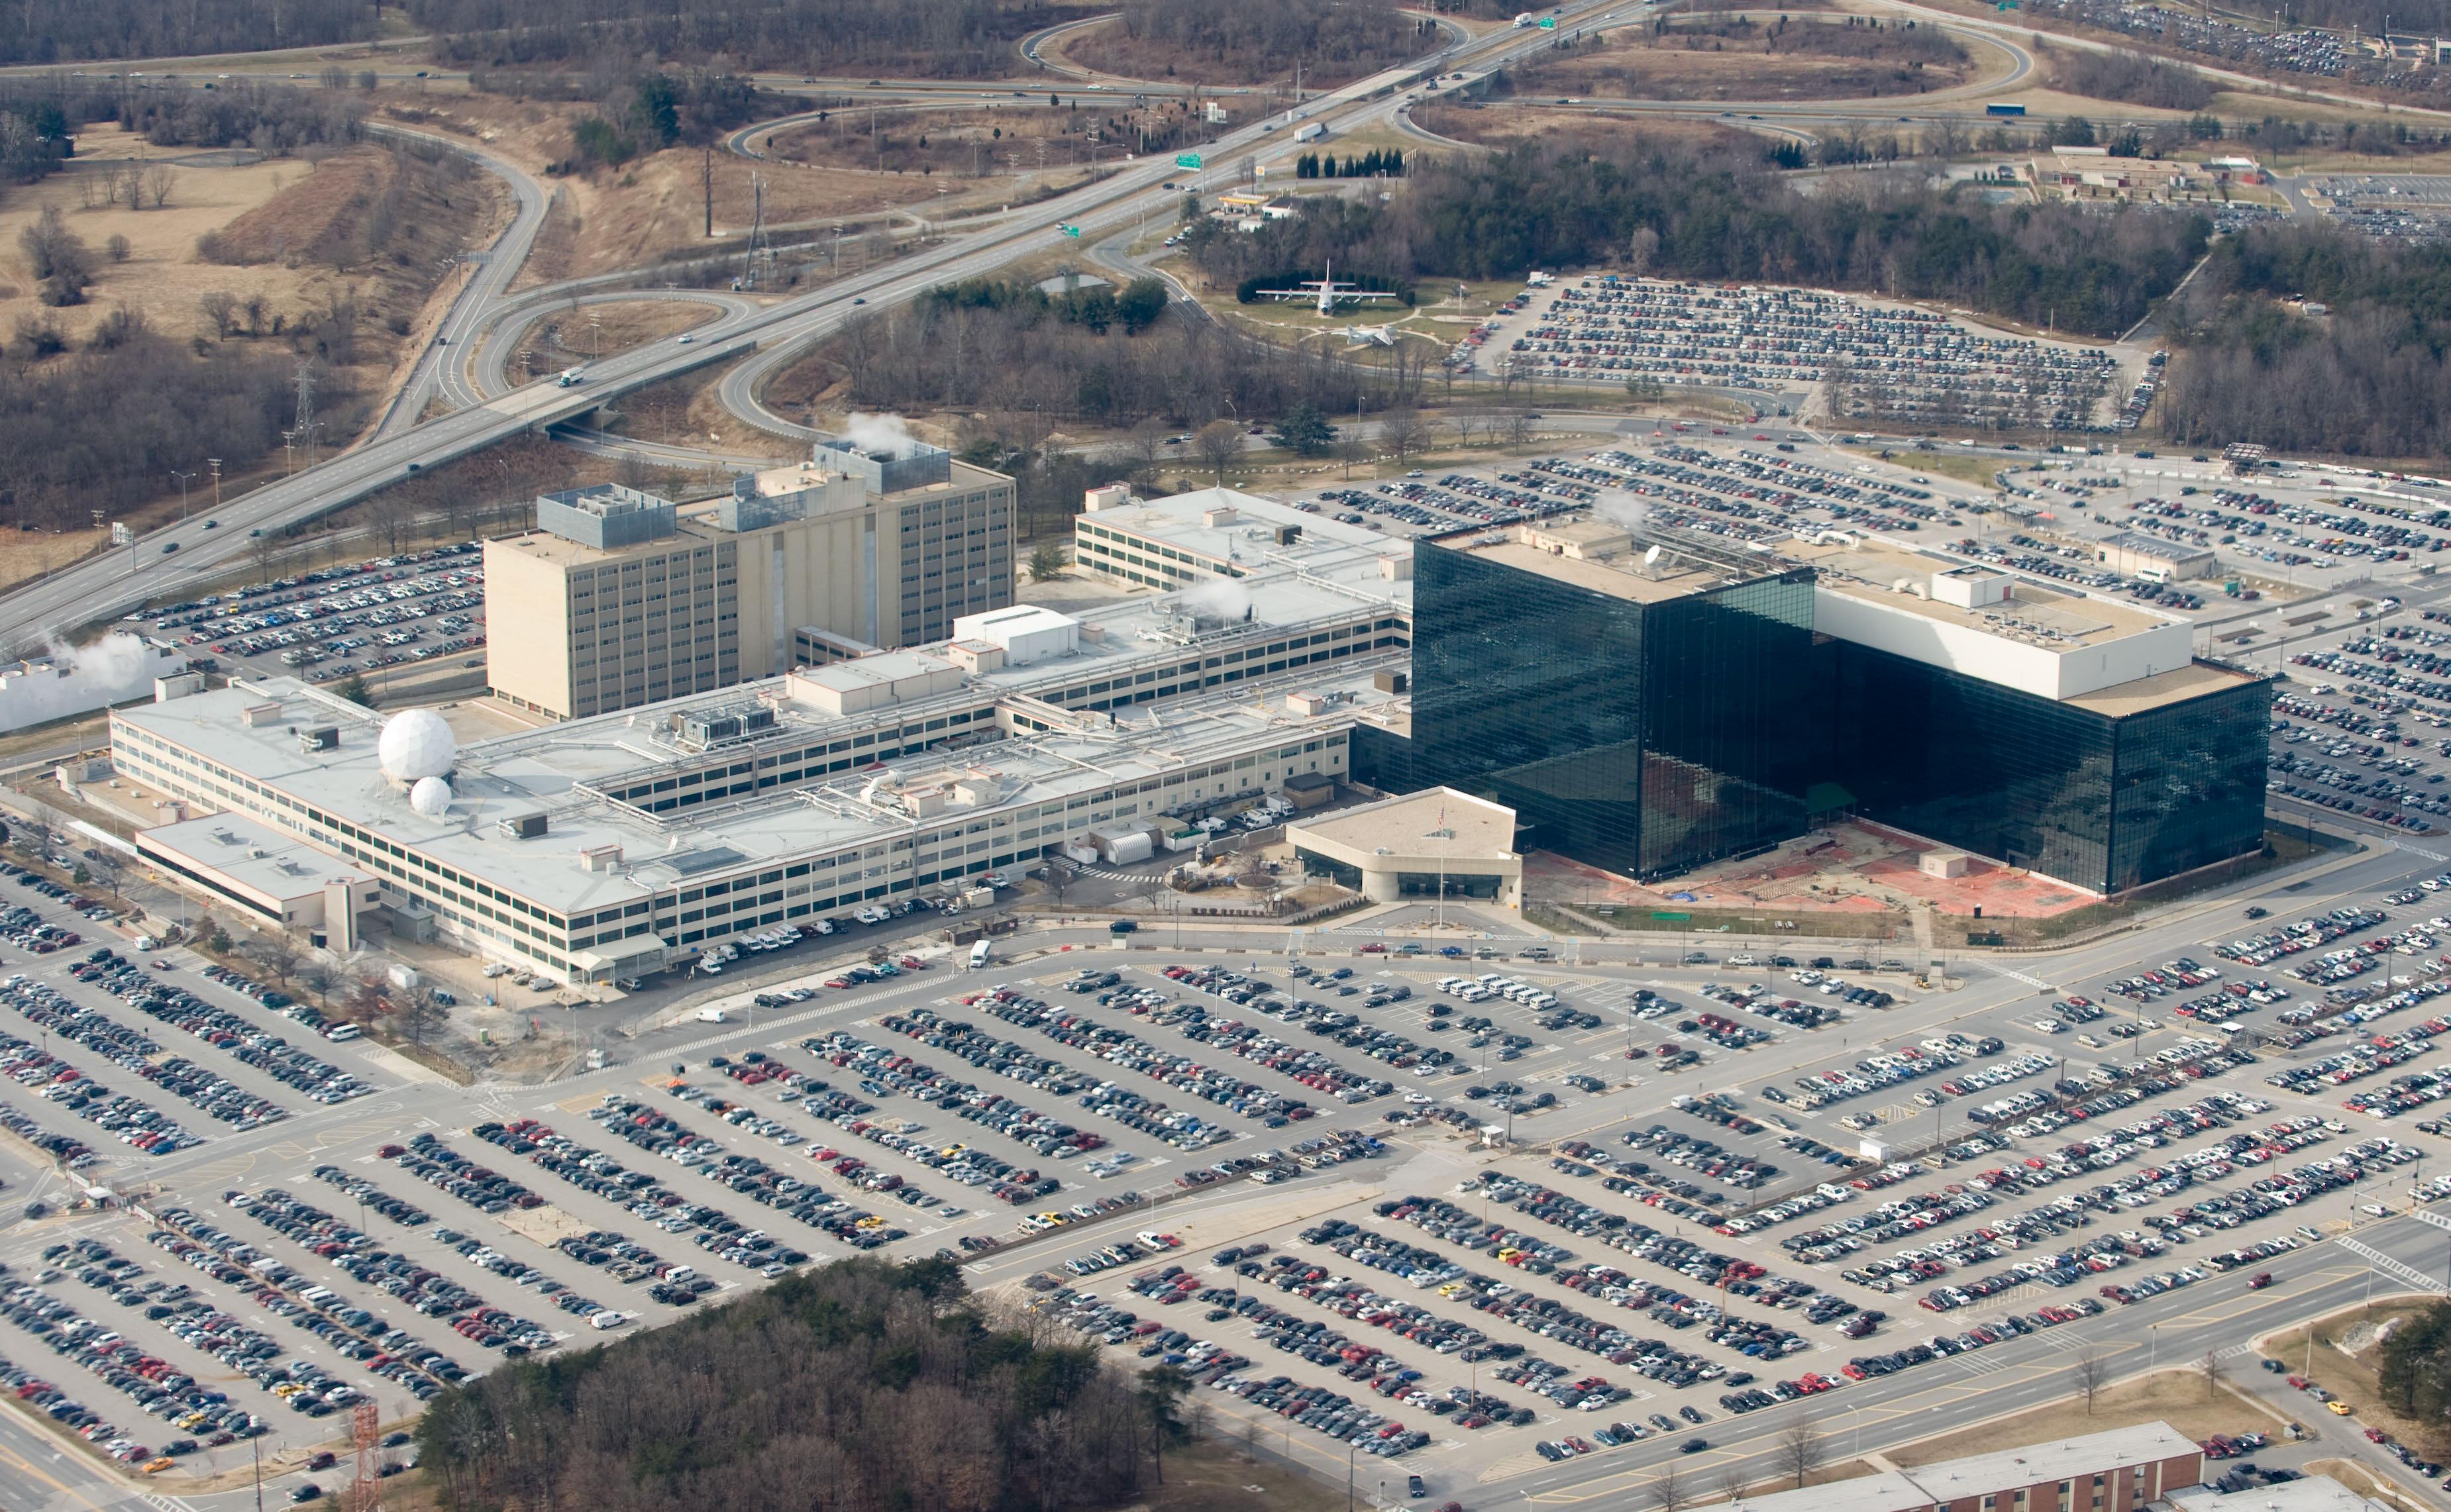 The National Security Agency (NSA) headq